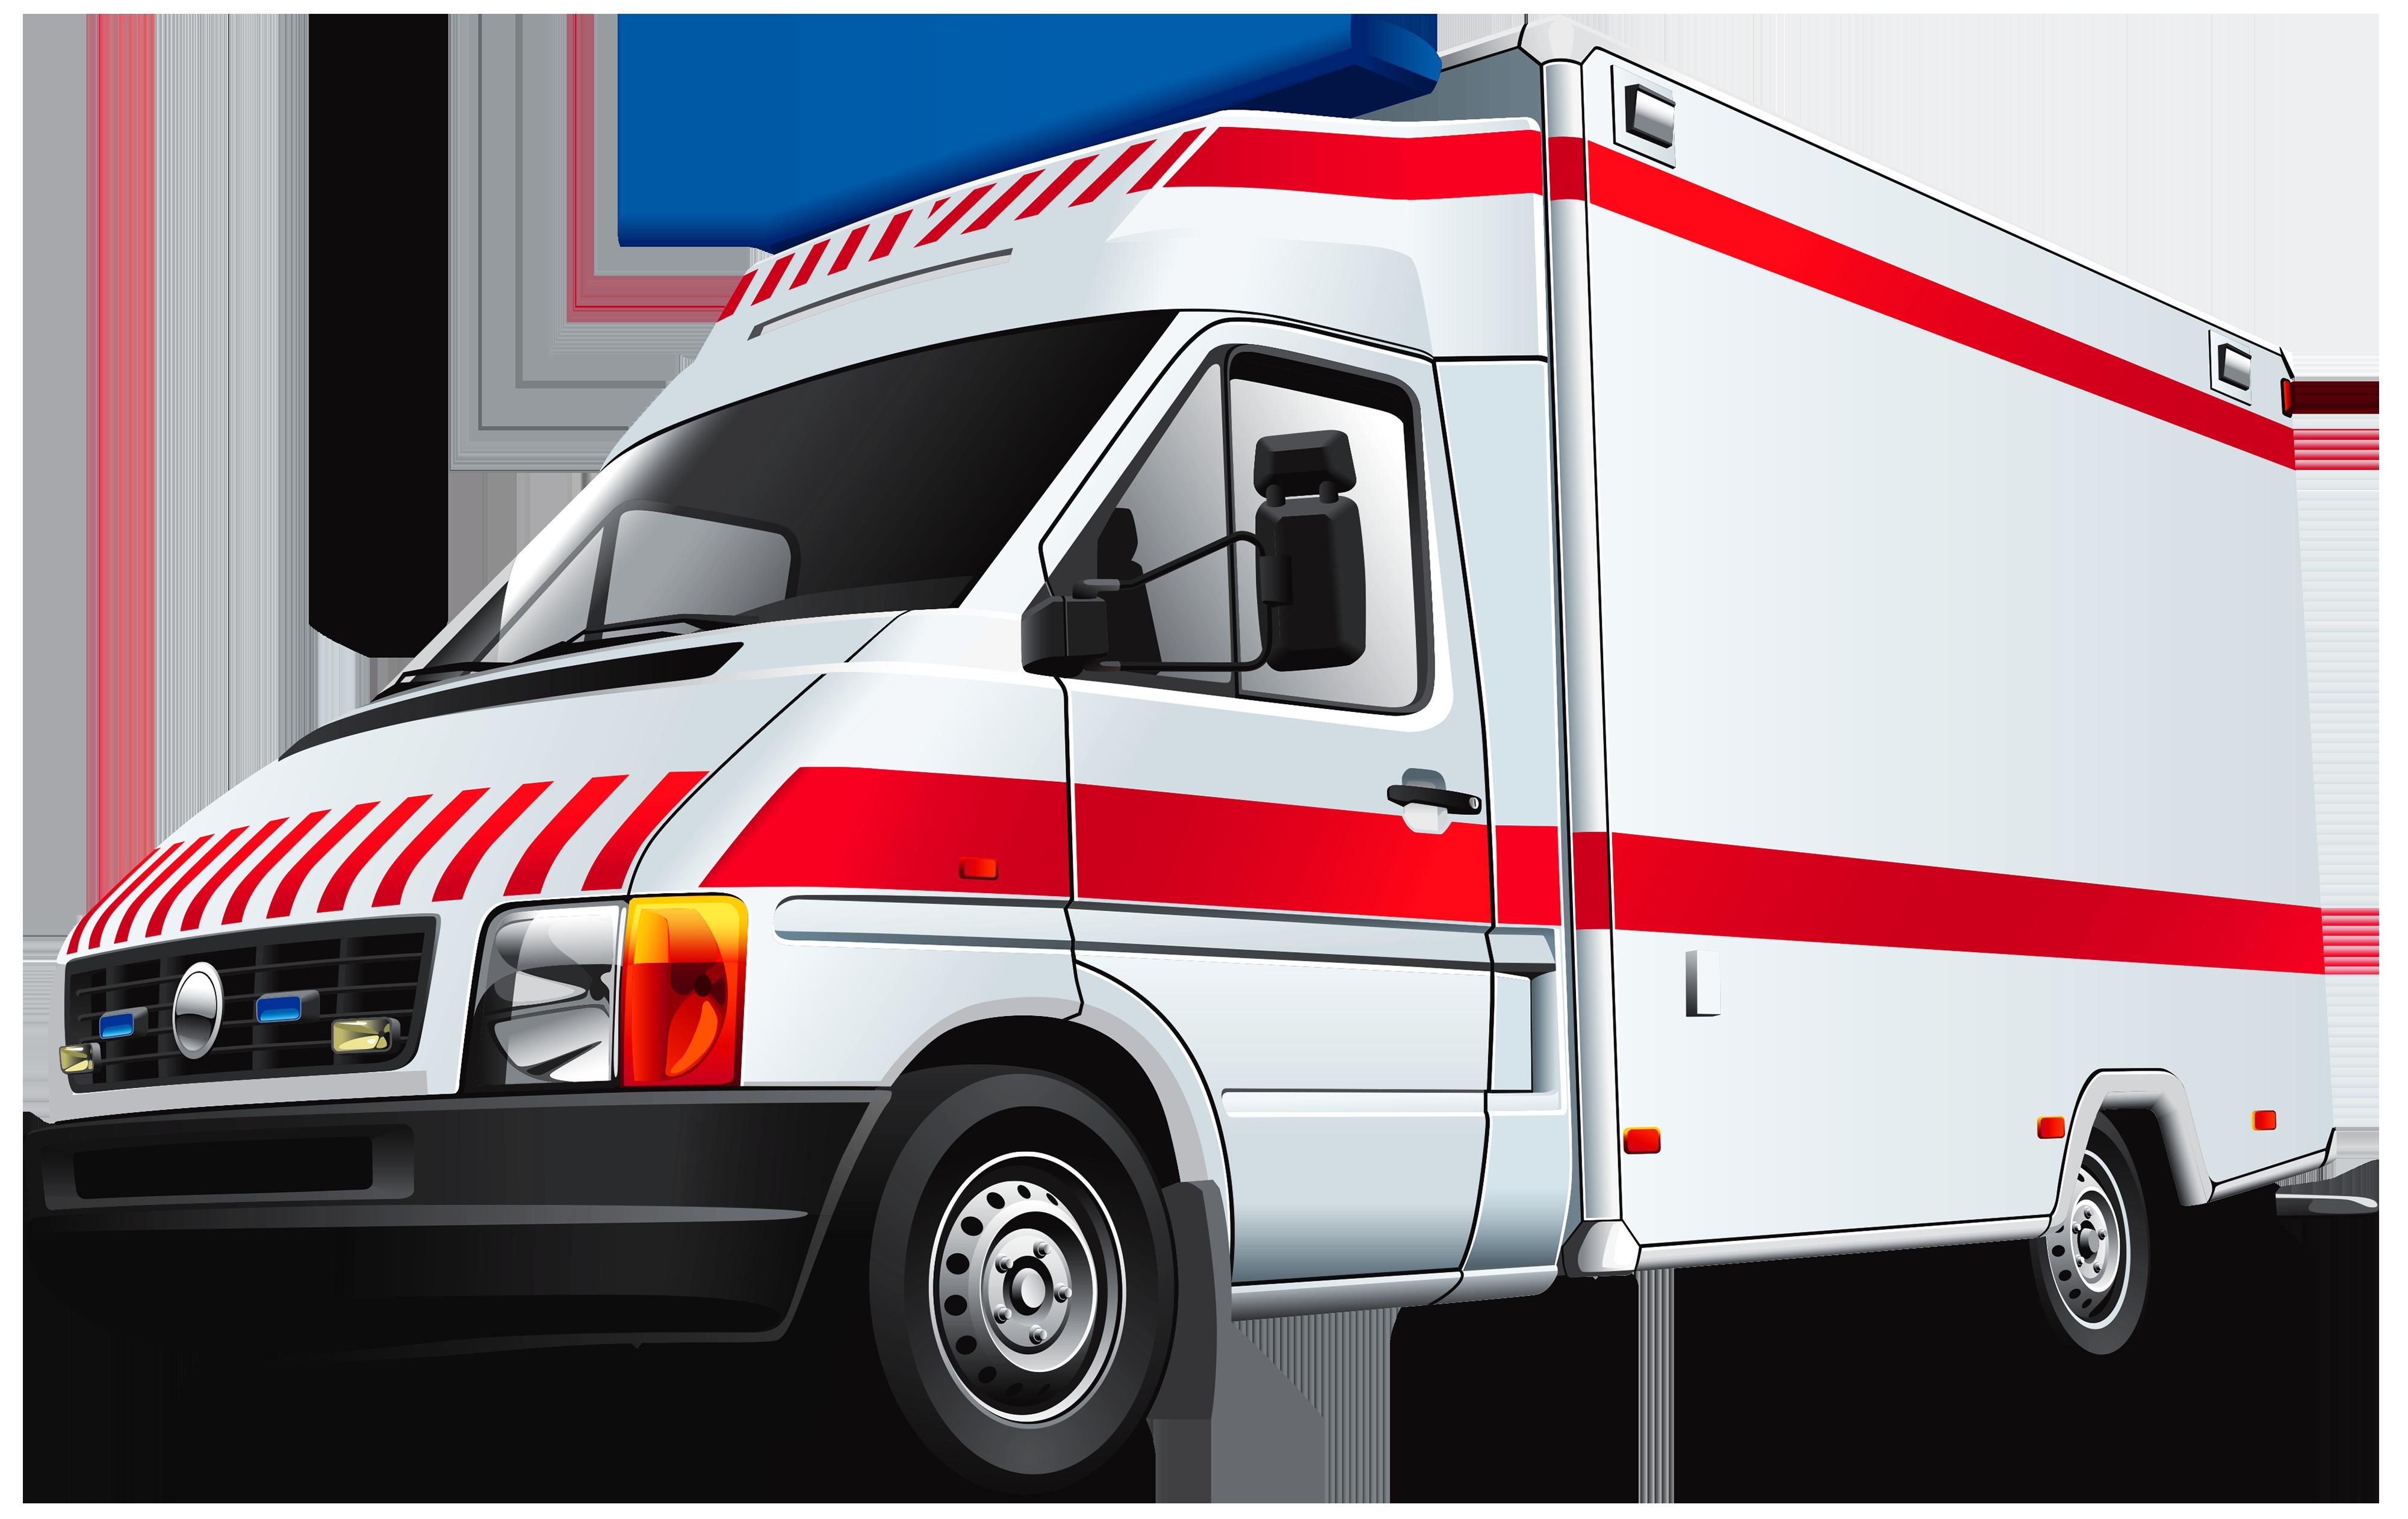 Emergency clipart ambulance car. Png clip art best